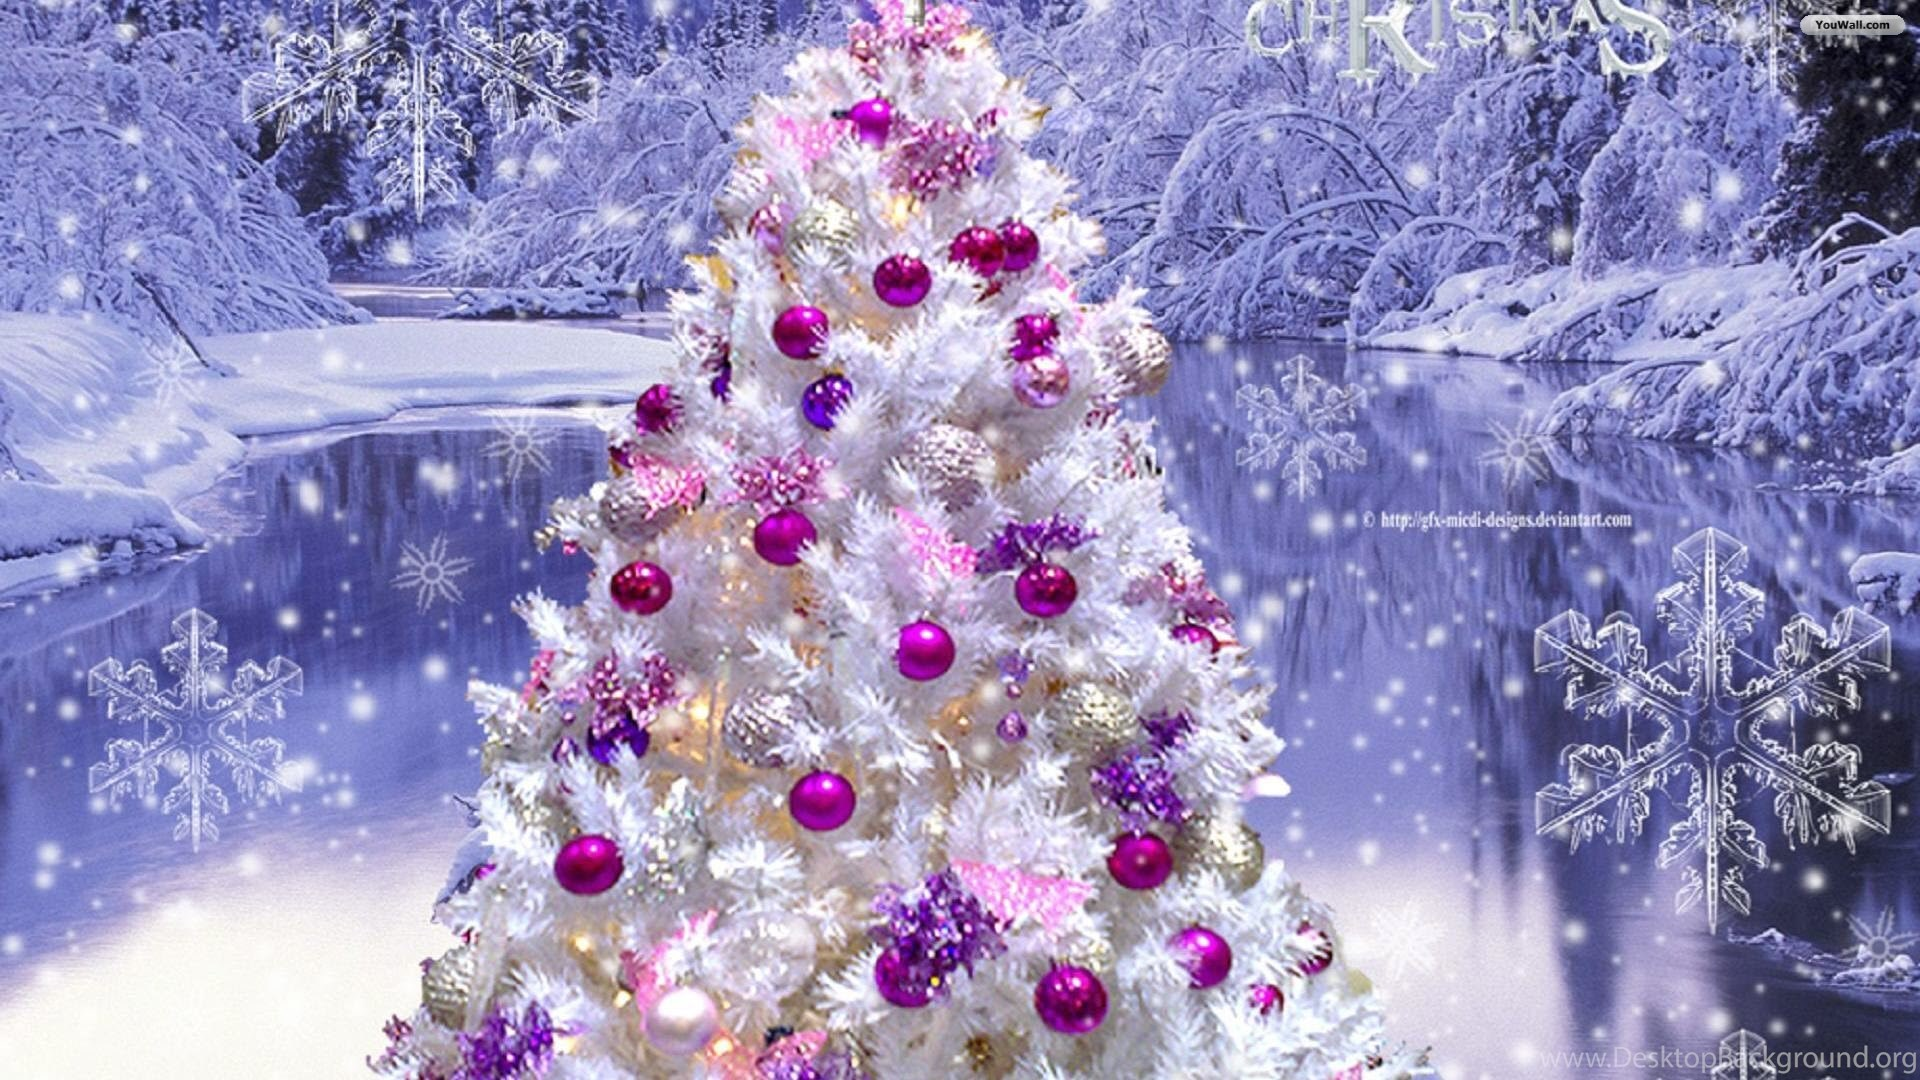 Free Christmas Desktop Wallpapers Best Hd Desktop Wallpapers 1080p